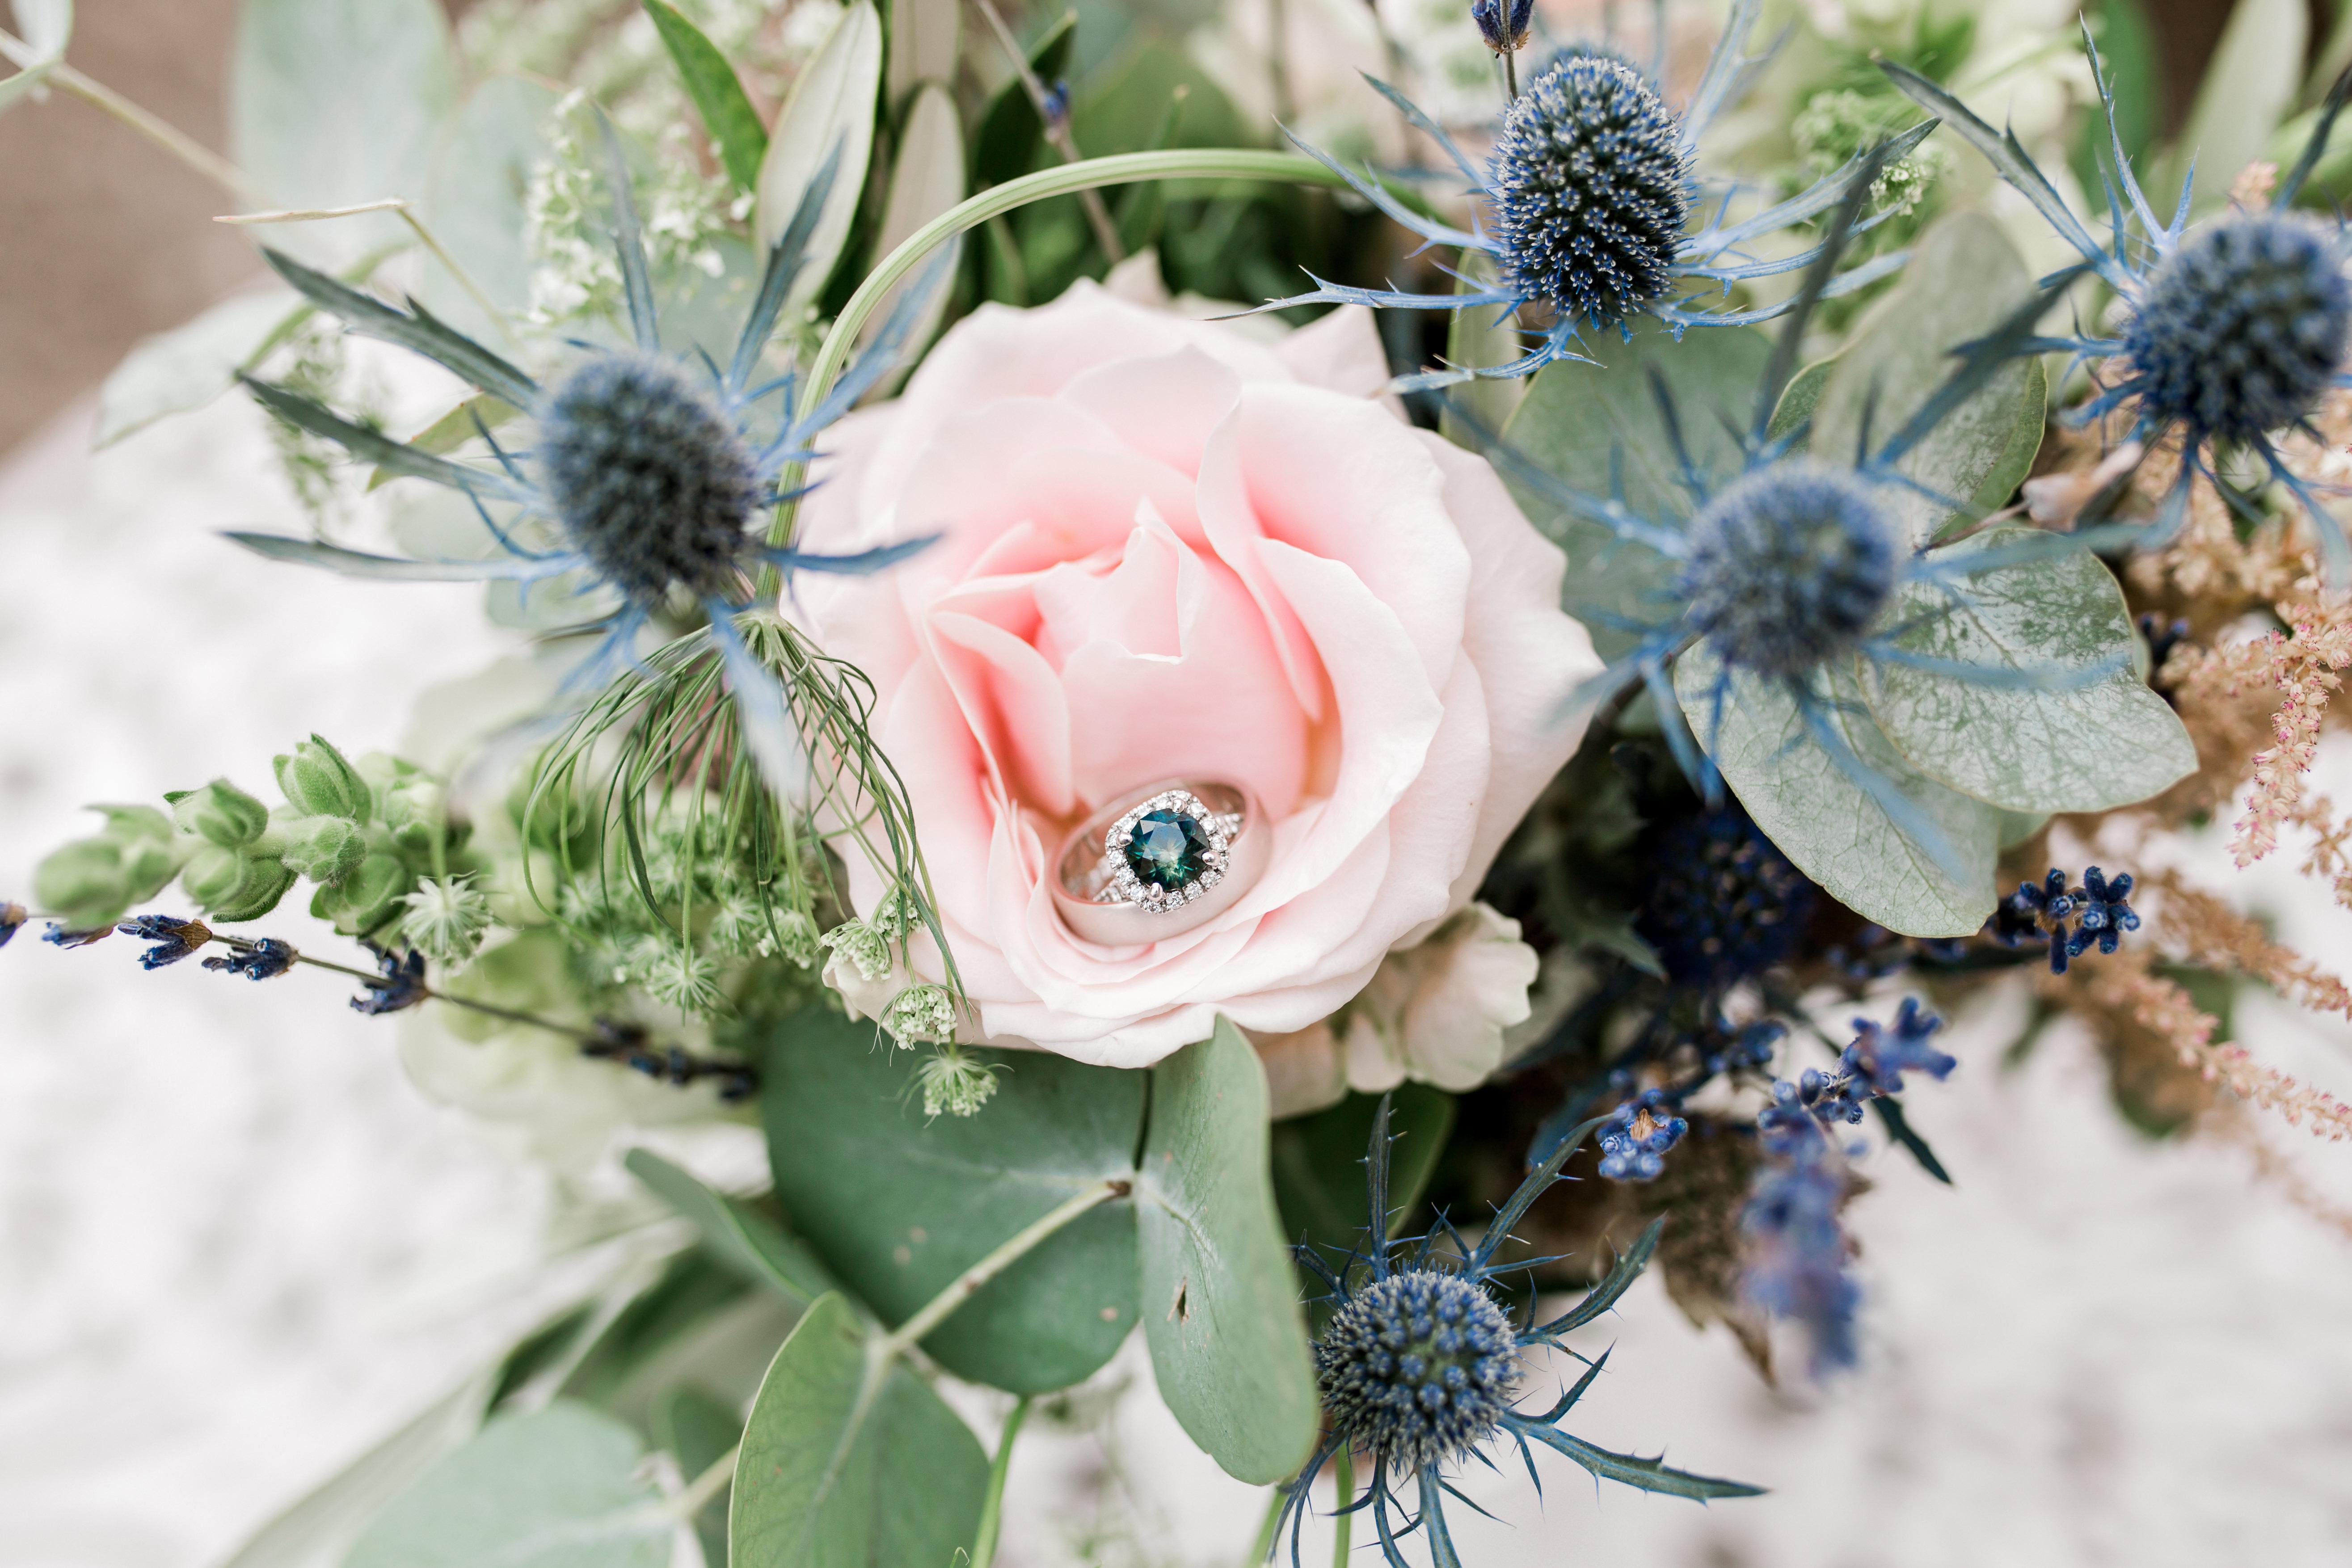 Chiddingstone Castle Wedding - Mikaella Bridal 2105 - Sam Areman Photo-3773